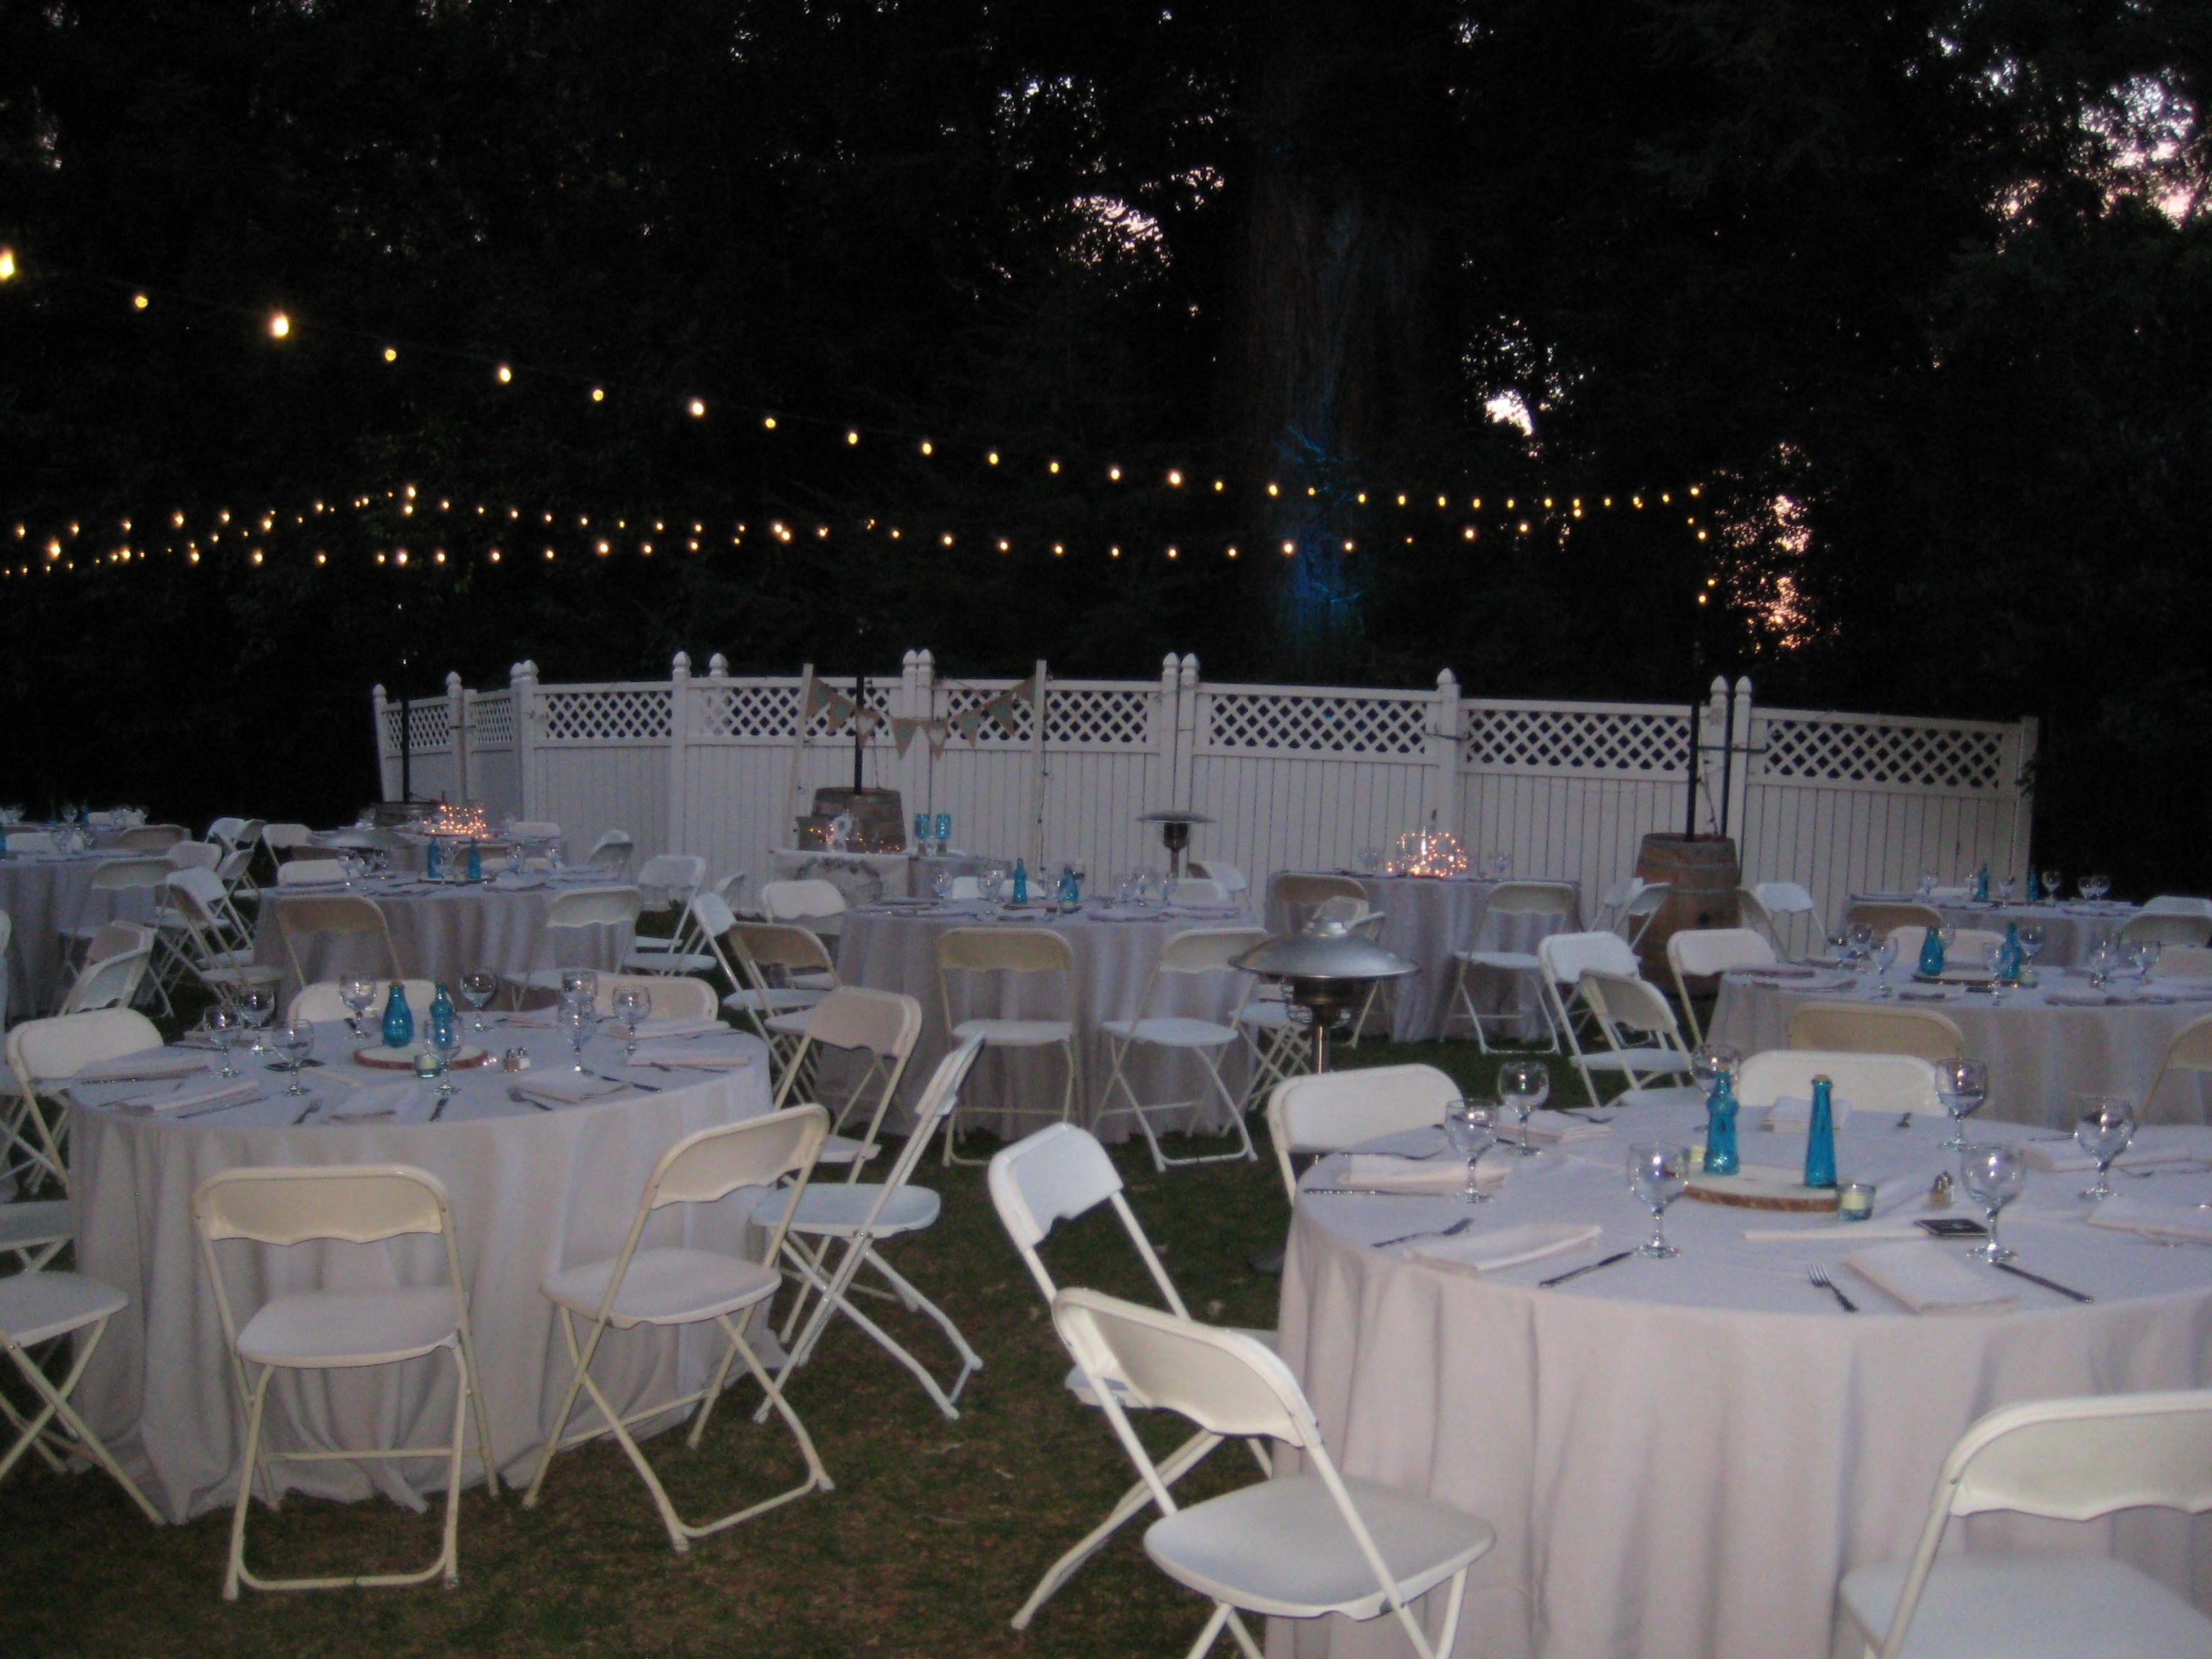 Burlap Wedding Accents Wedding Decor Elegant Wedding Reception Chairs Wedding Table Decorations Elegant